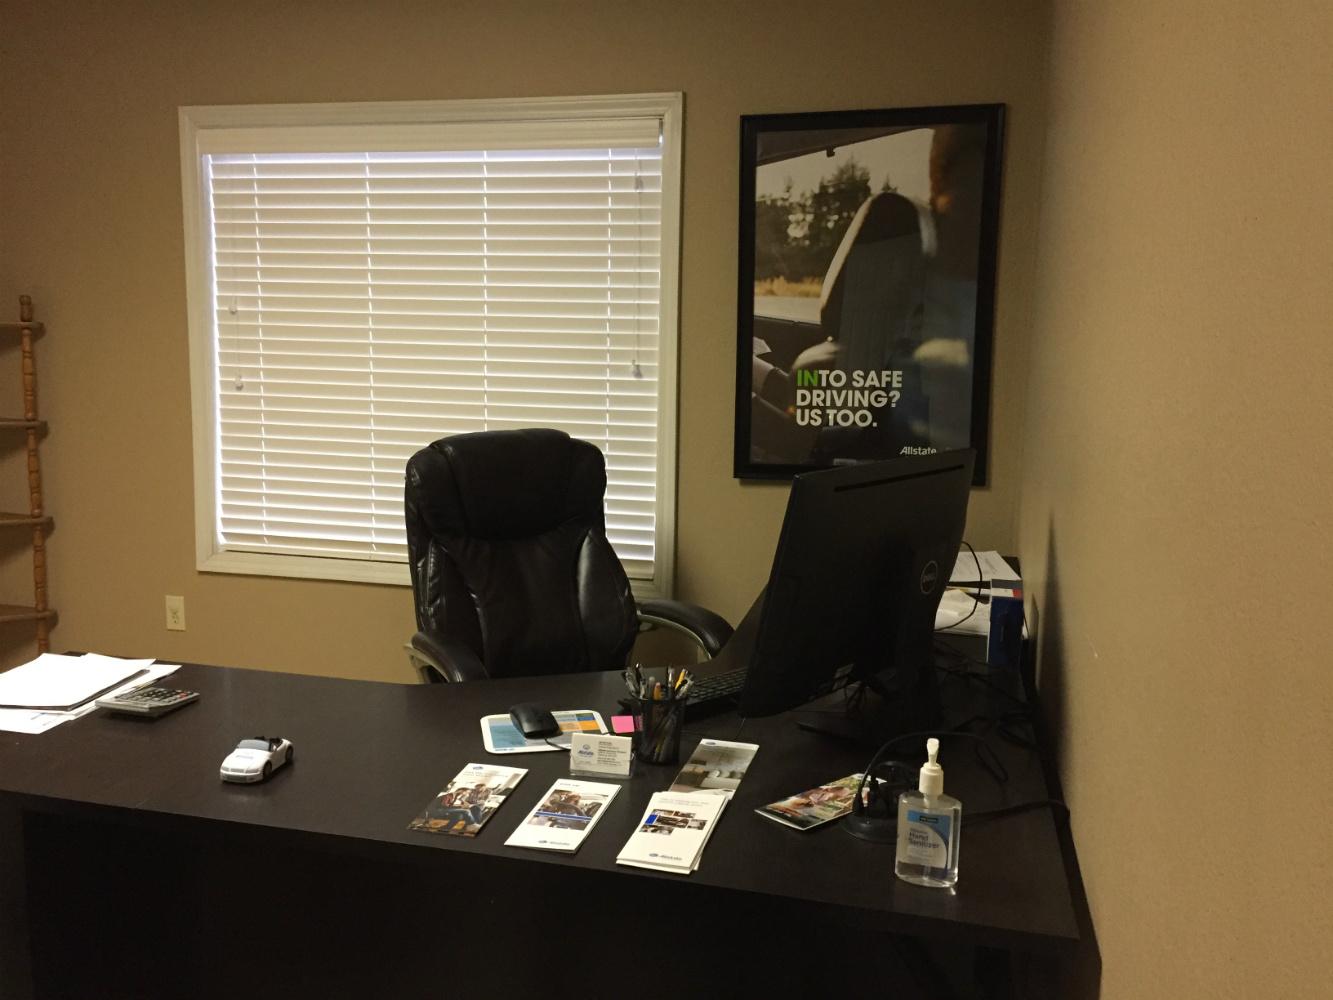 Amanda Stagg: Allstate Insurance image 5